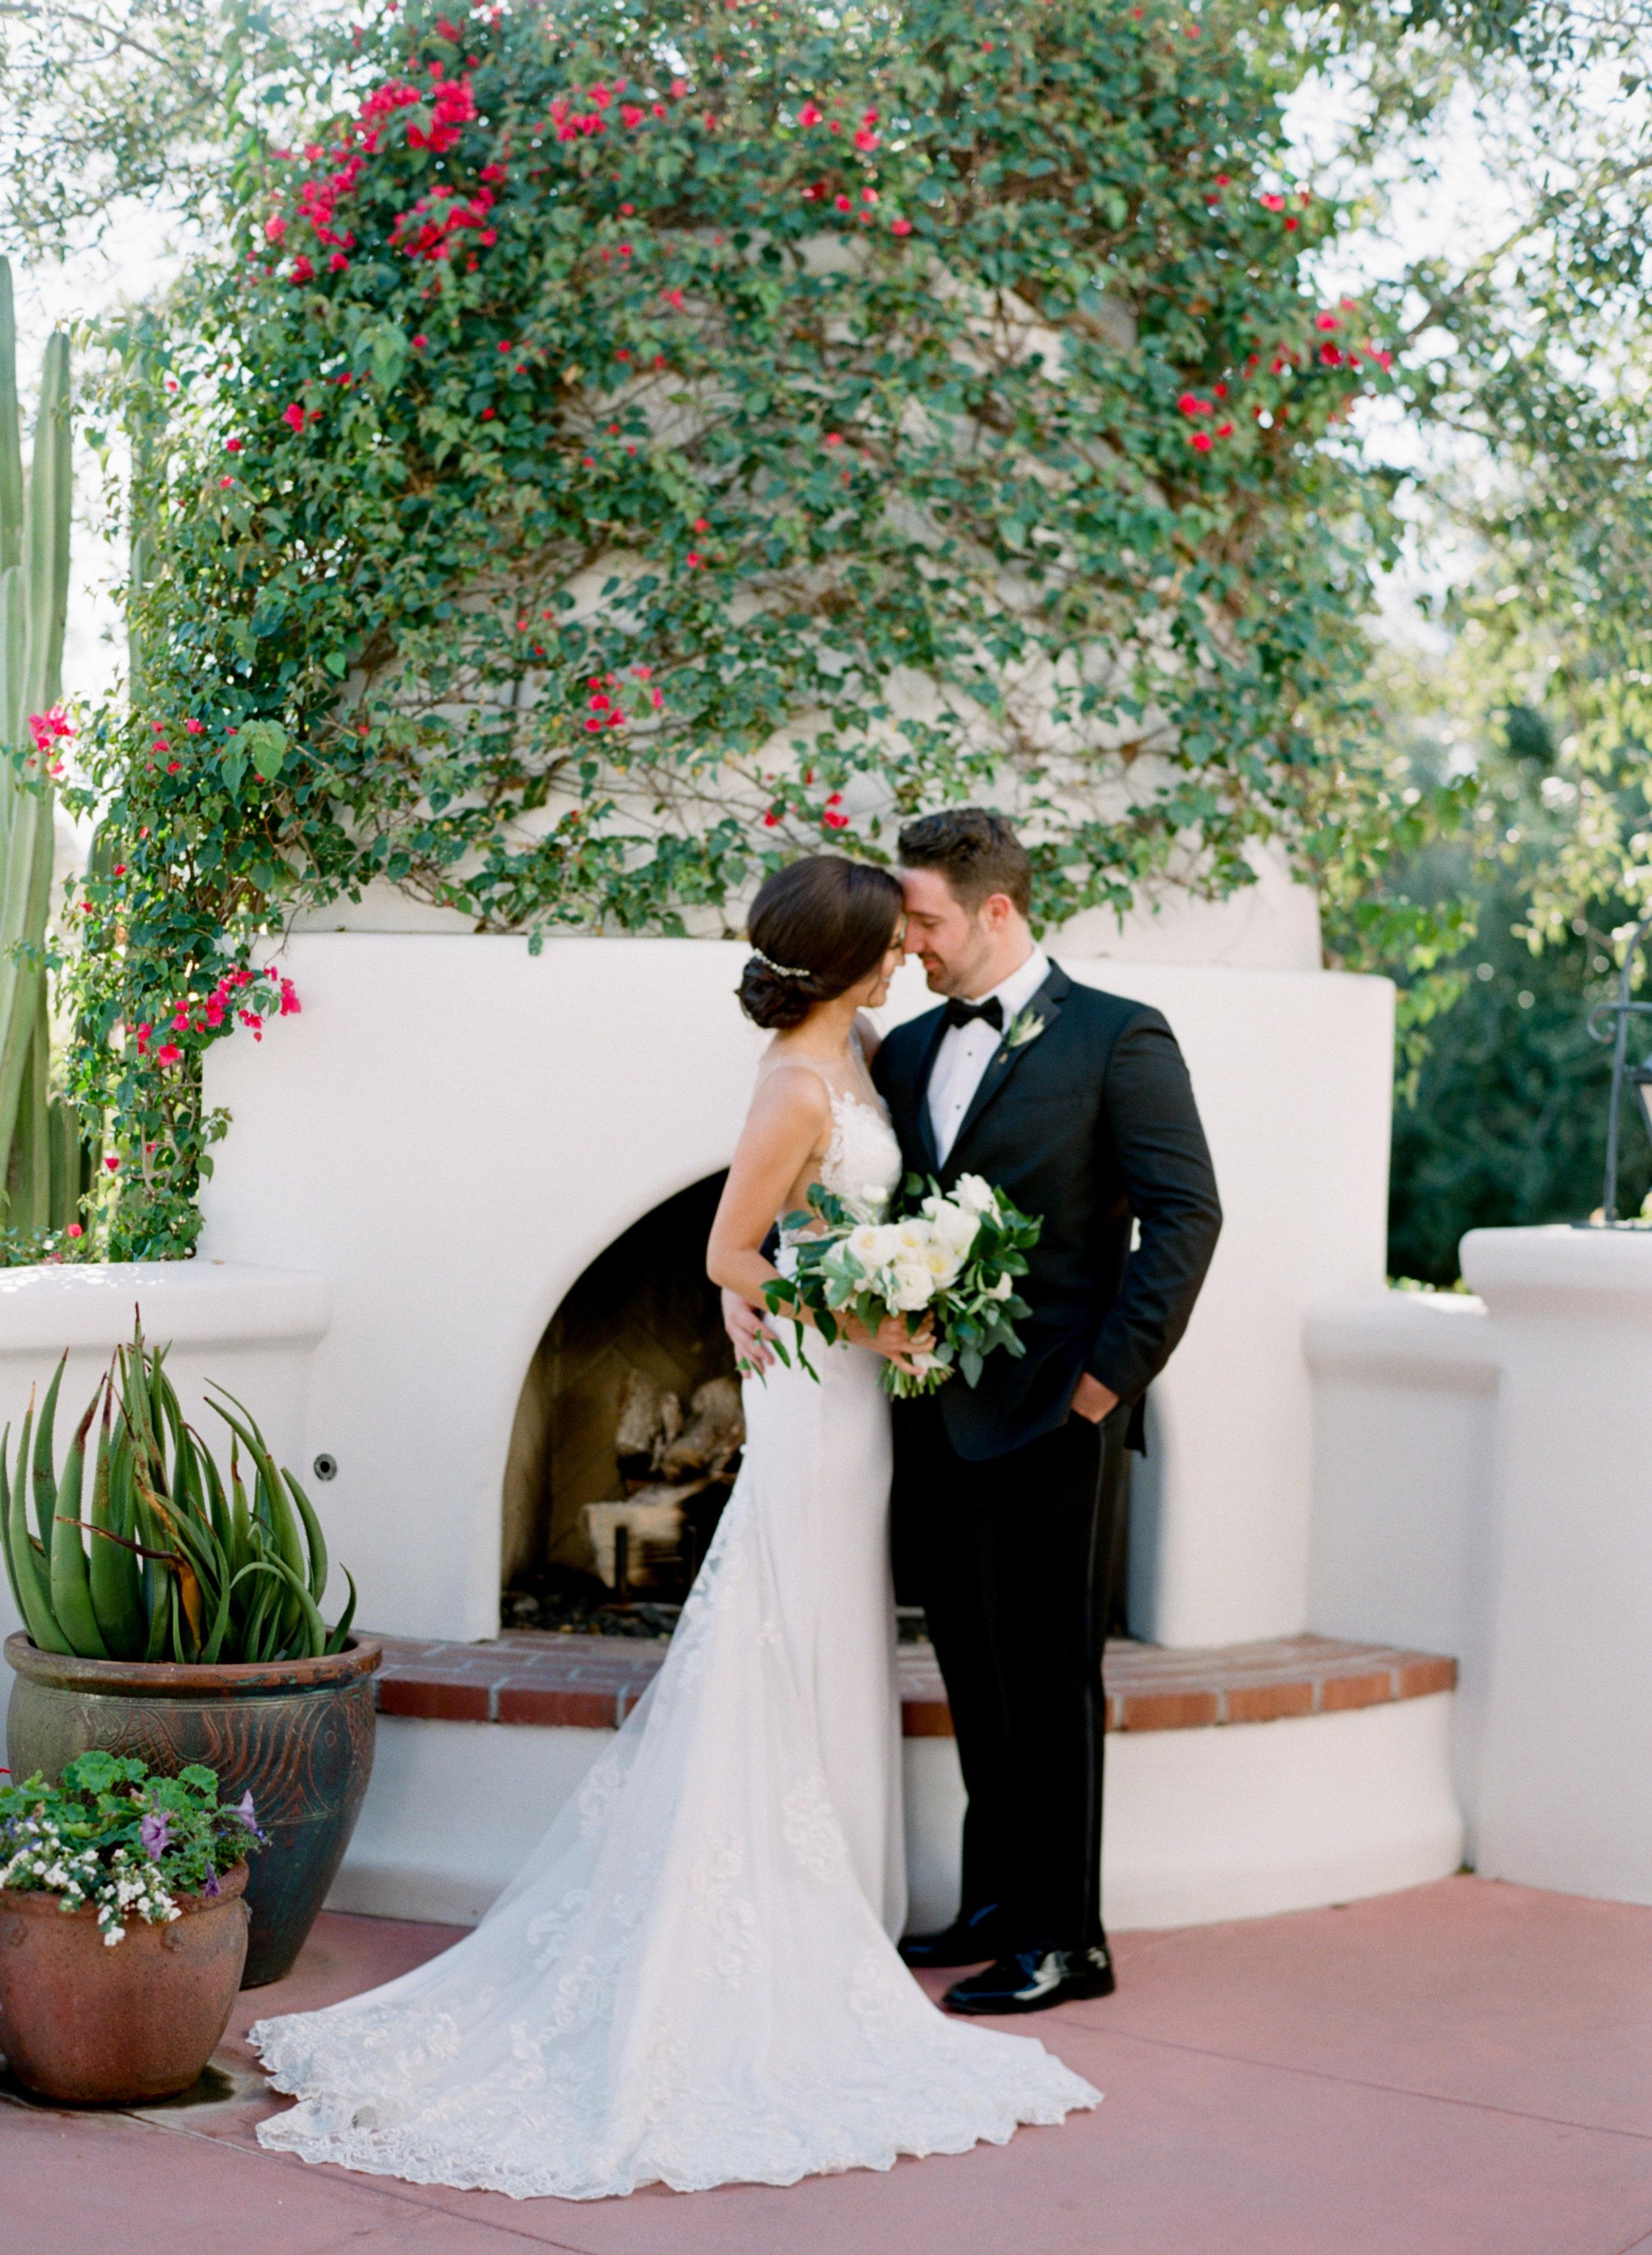 Nick and Erica Wedding at El Chorro-13-7.jpg